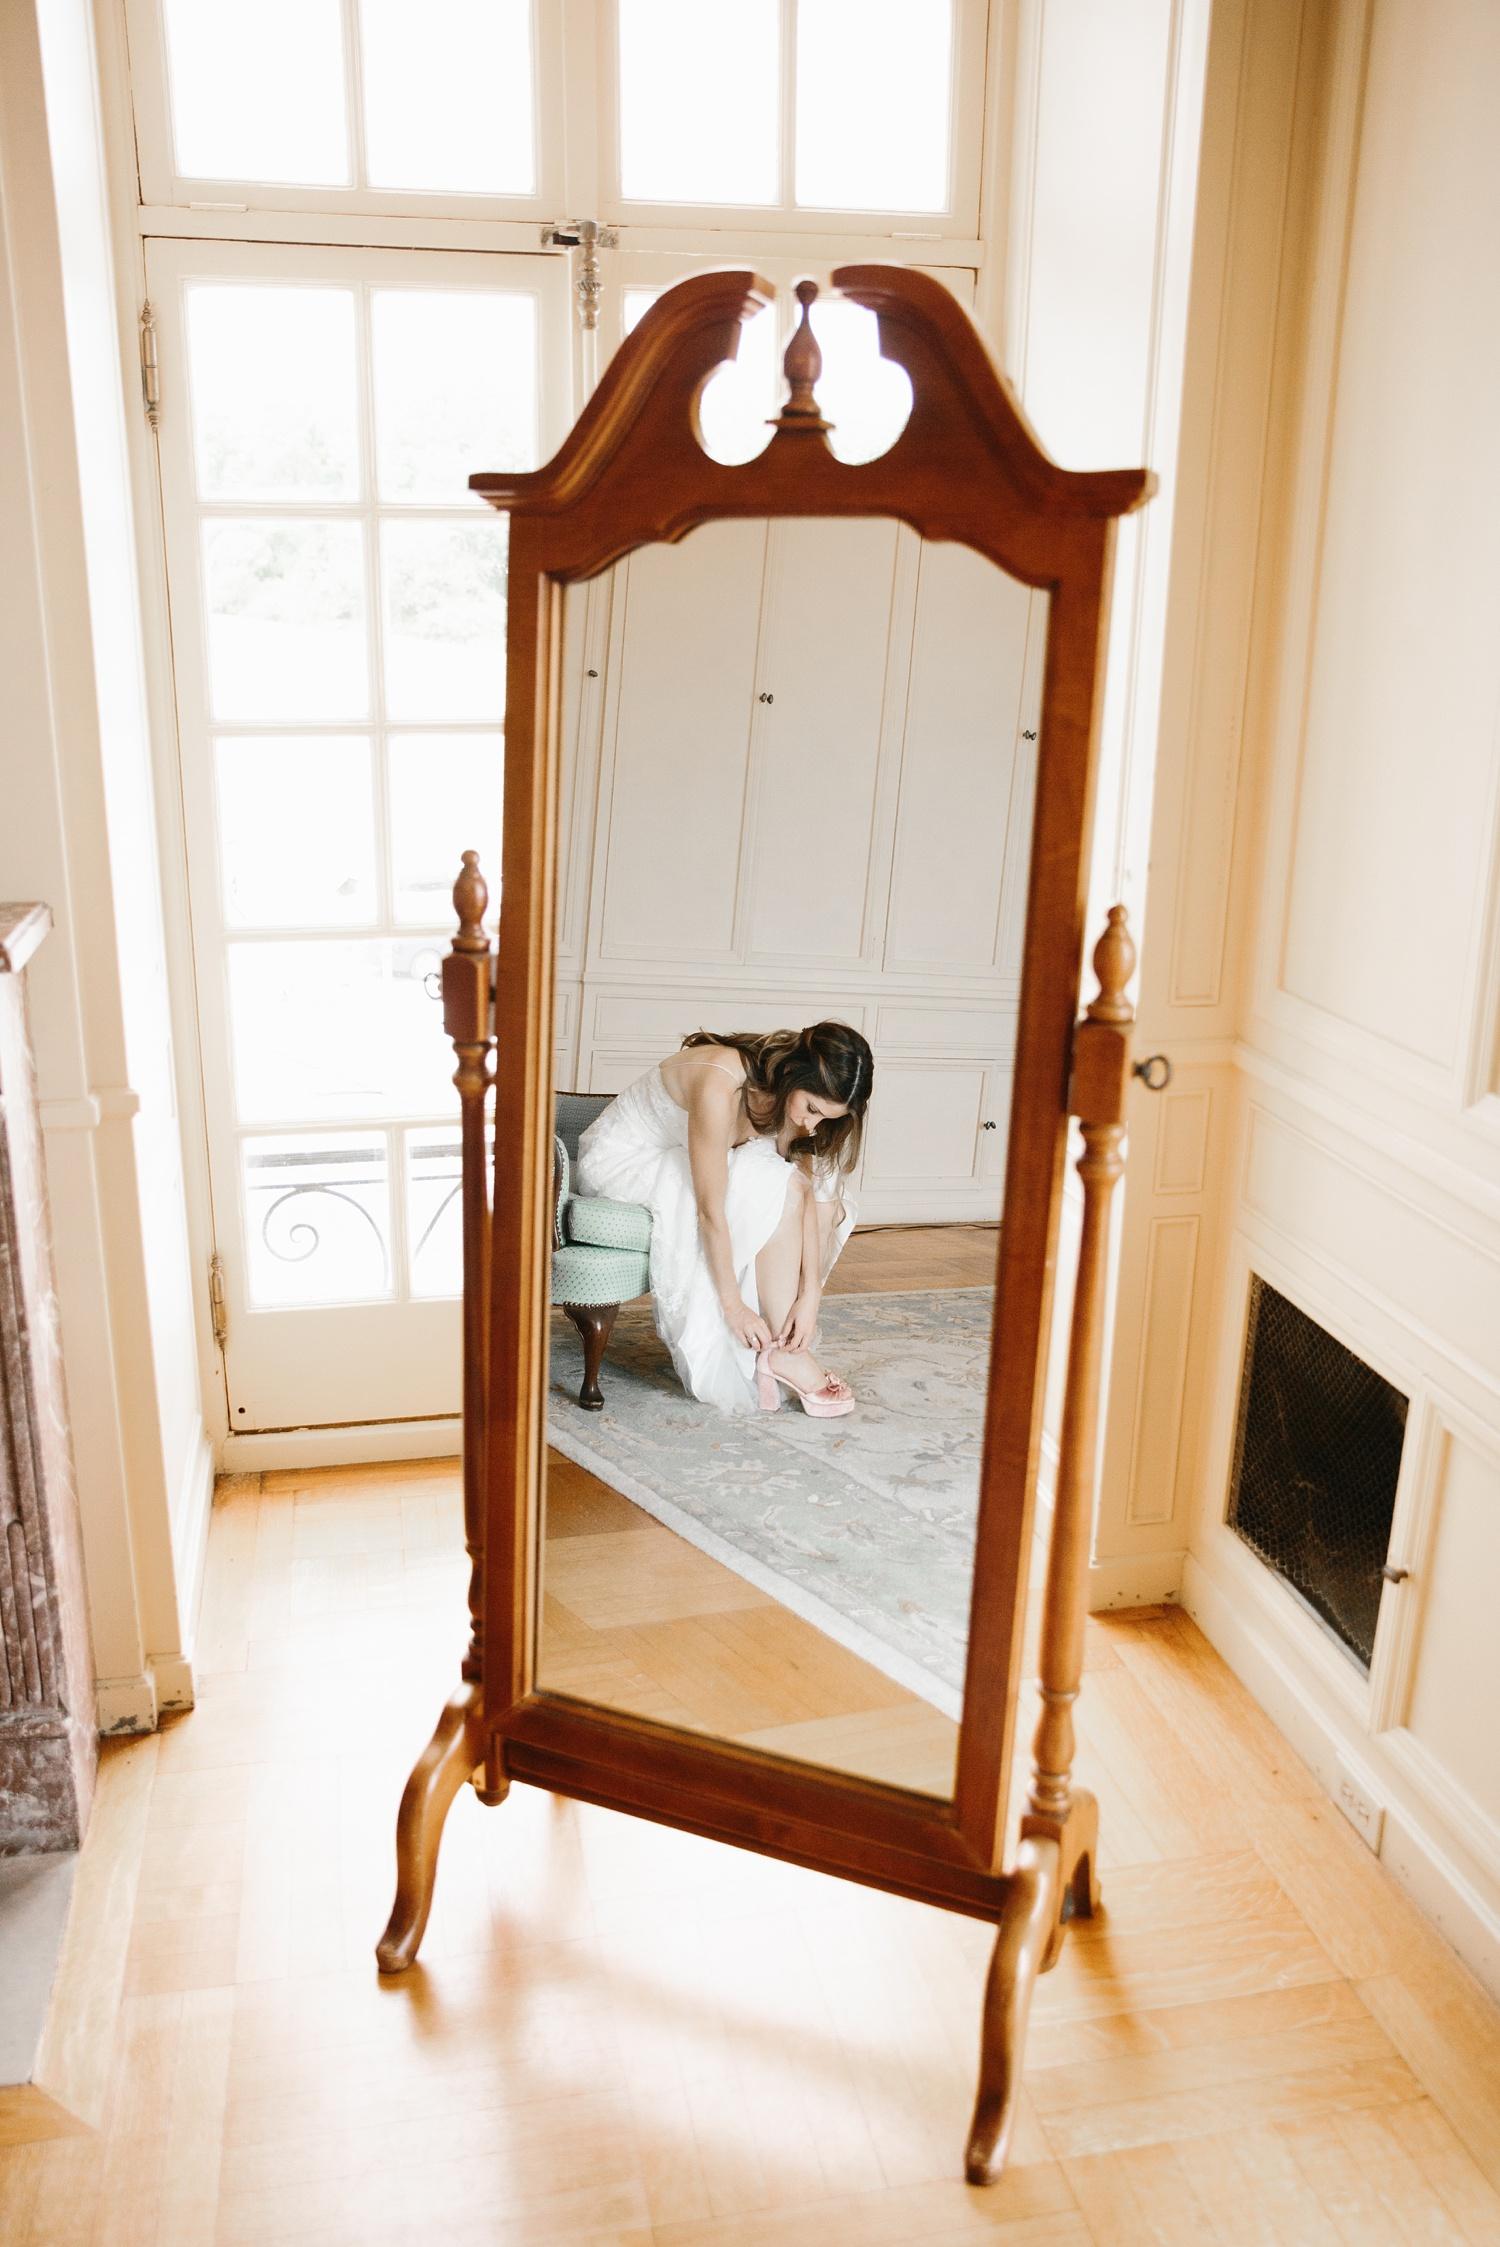 Daniel_Sarah_Glen_Manor_House_Wedding_003.jpeg